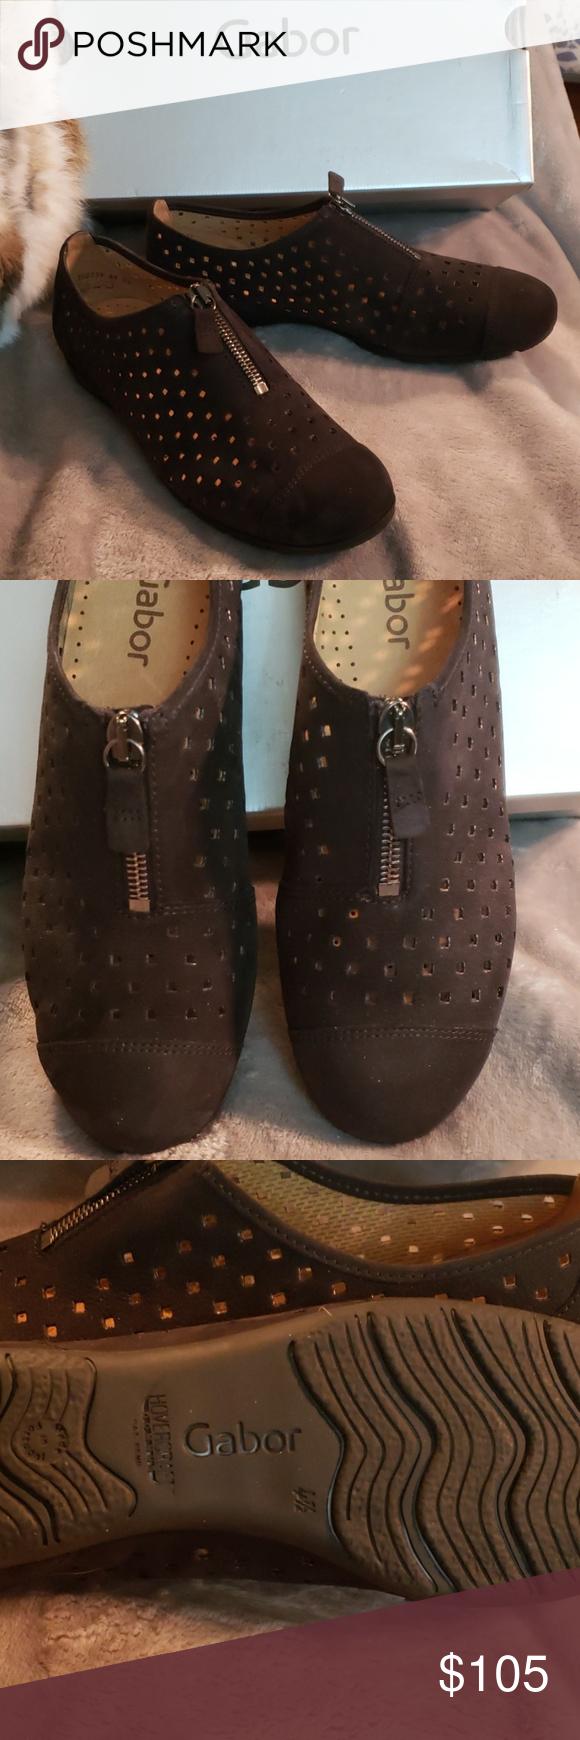 Neueste Mode Größe 7 abgeholt Gabor Nubuck hovercraft shoes amazing EUC. Lightweight and ...